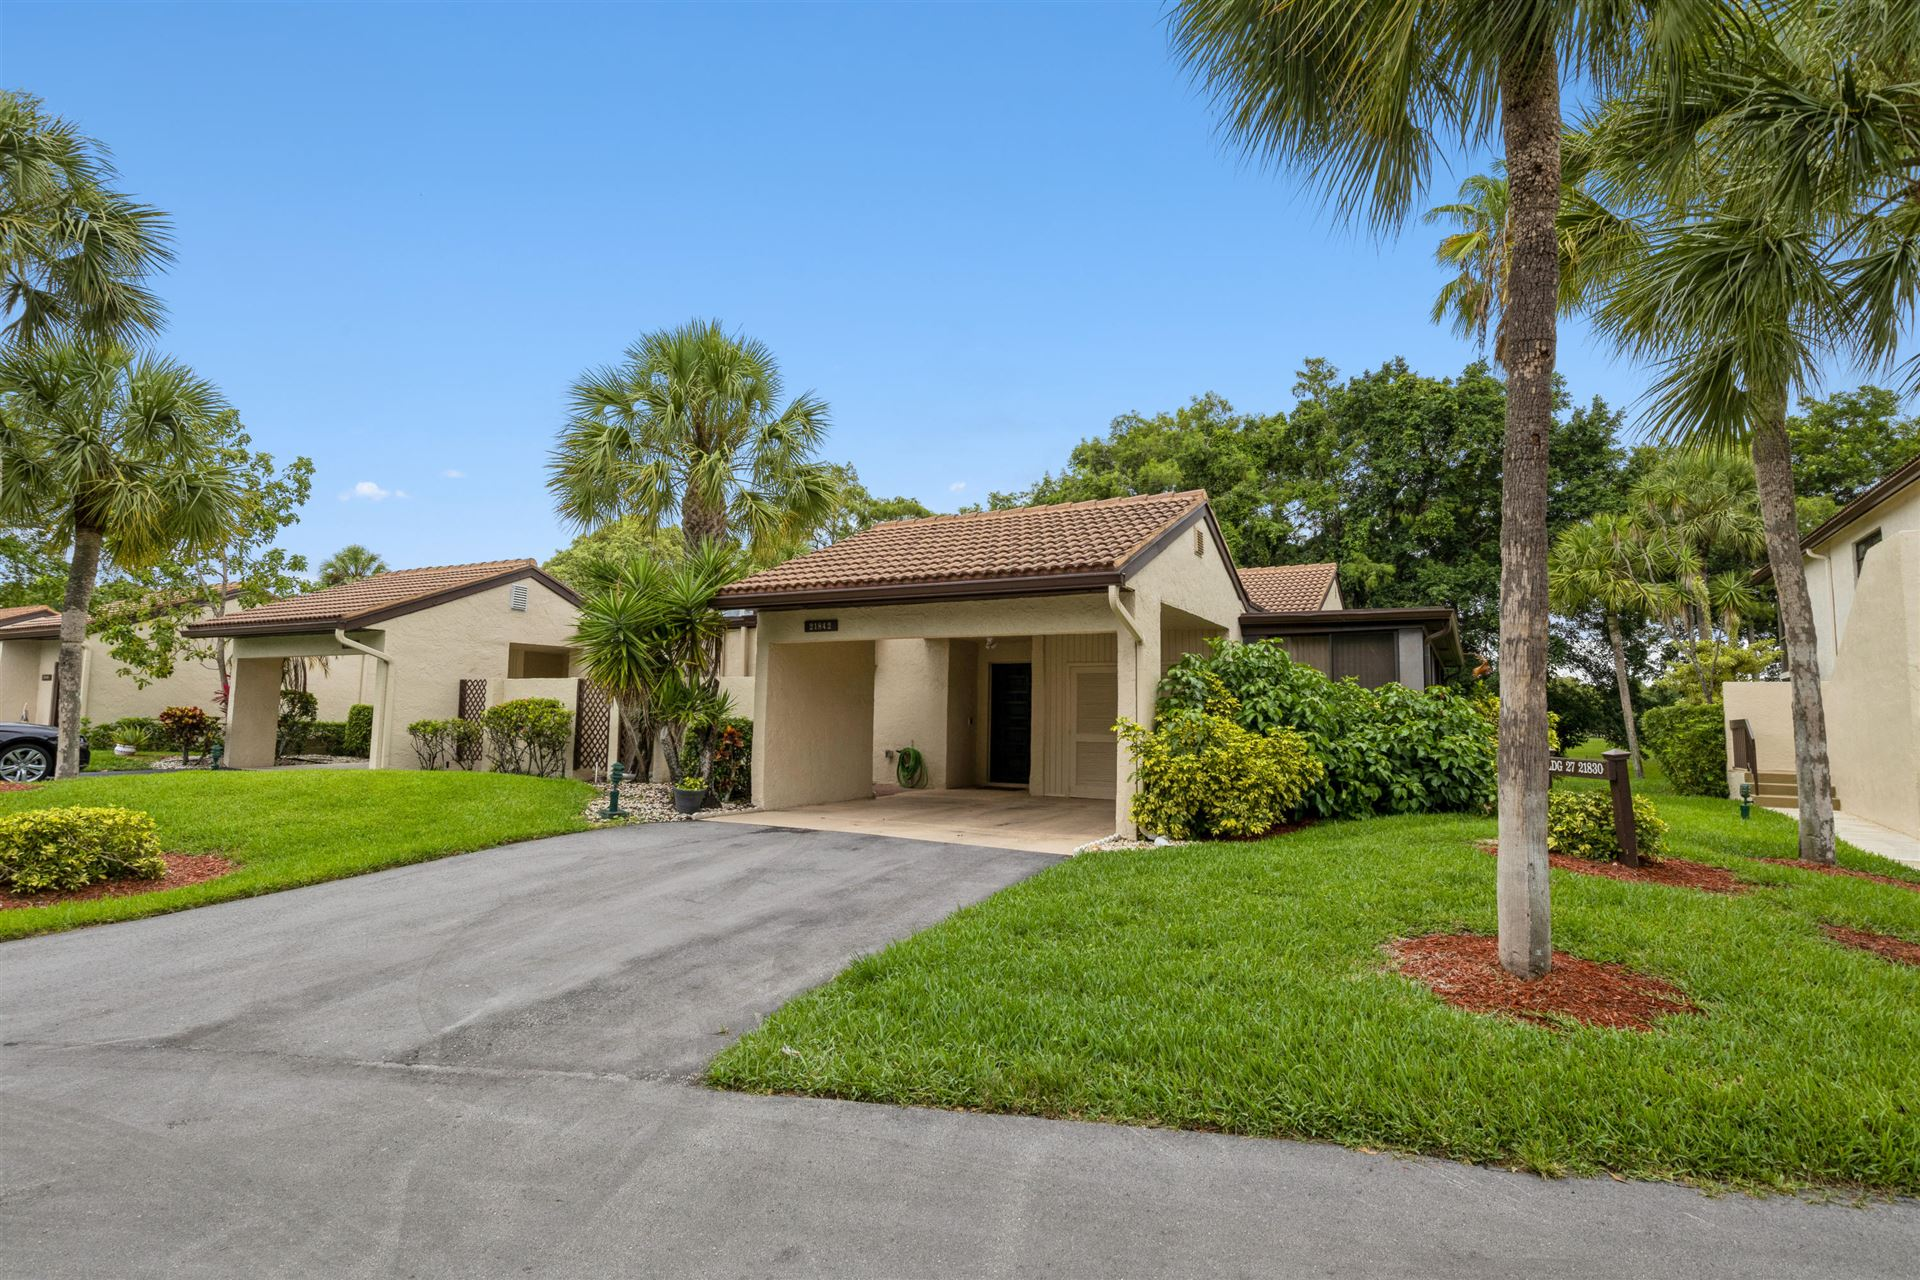 21842 Cypress Circle #28b, Boca Raton, FL 33433 - MLS#: RX-10724041